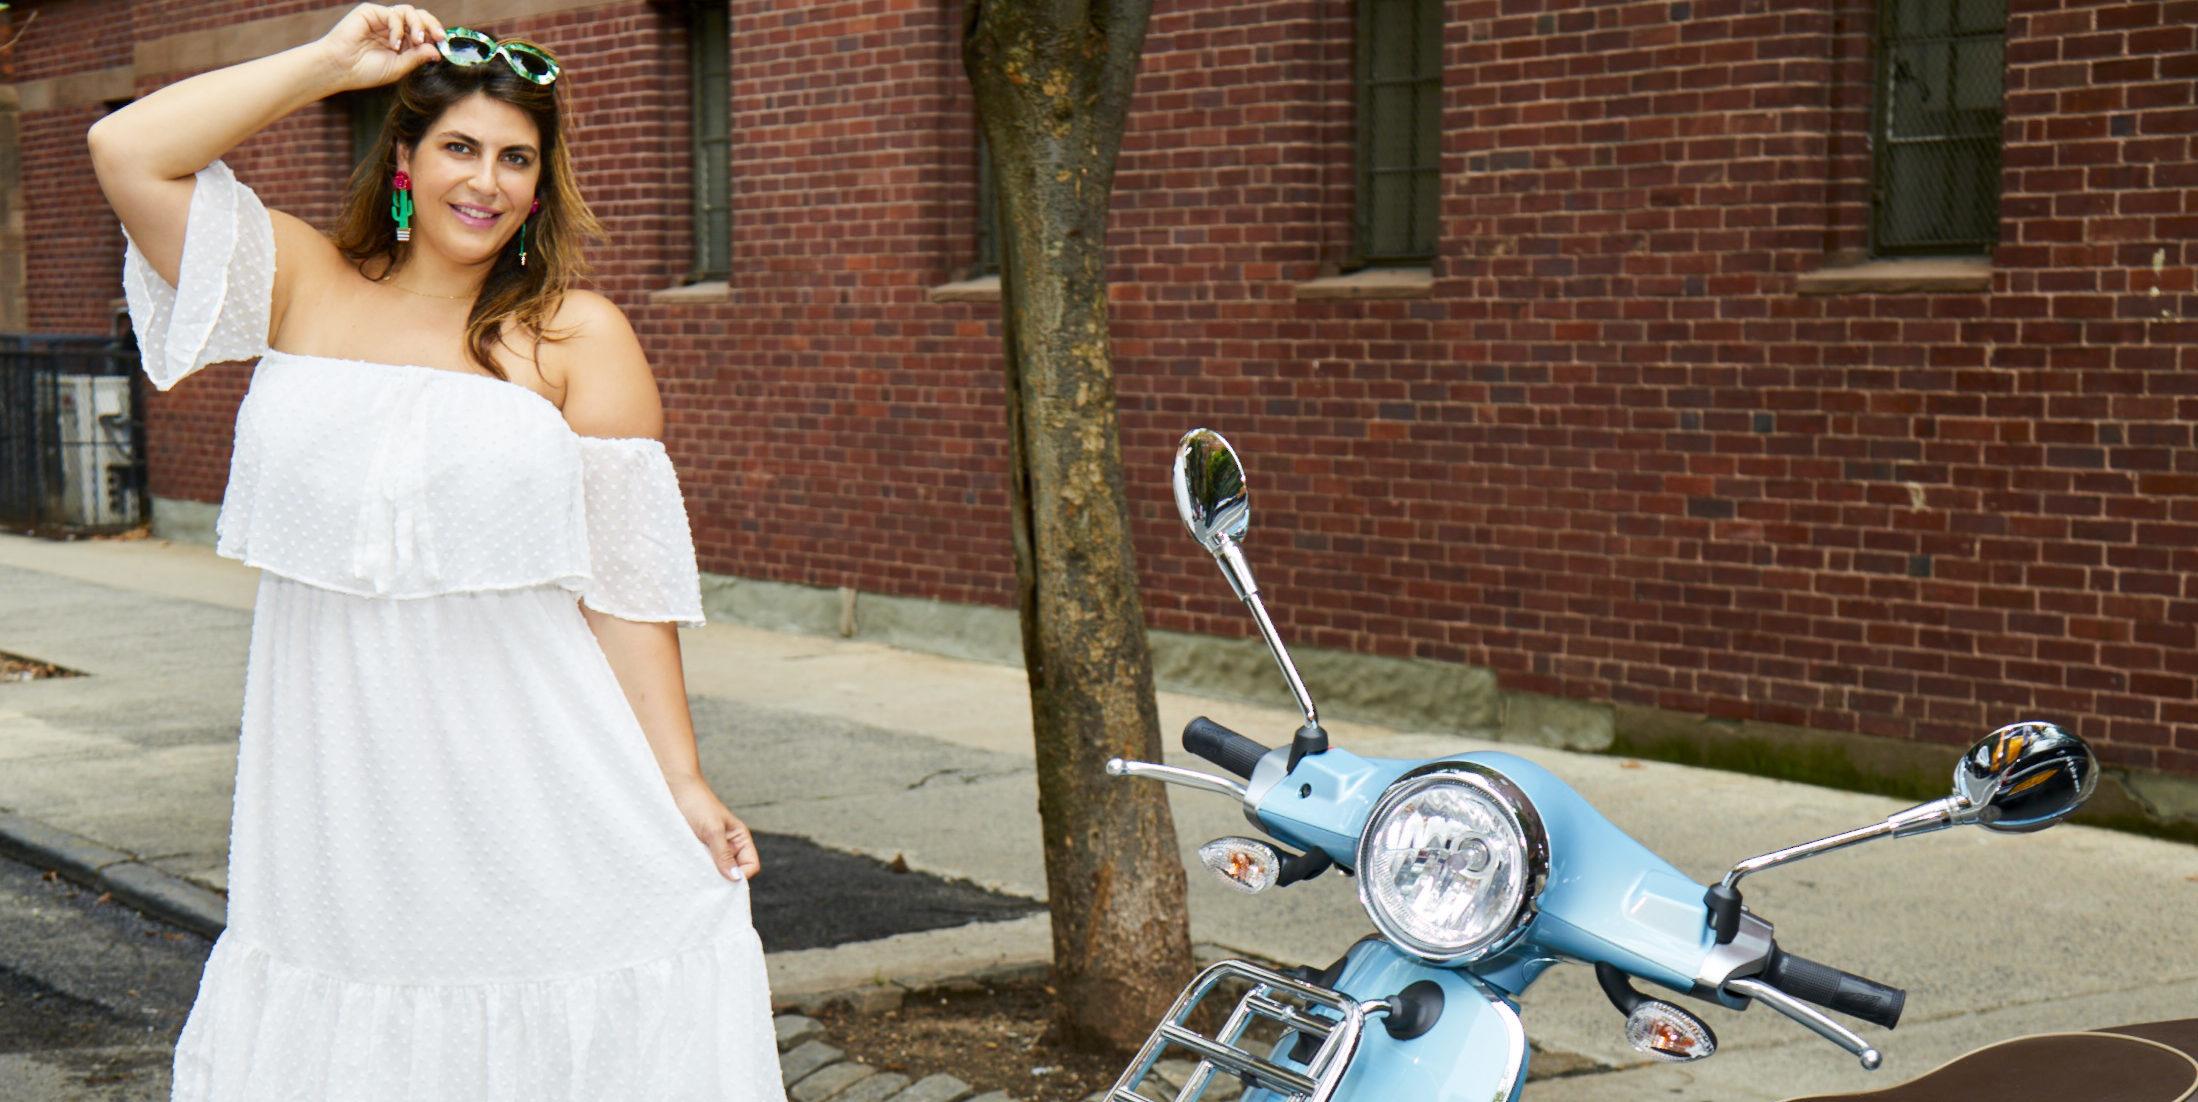 17-07-24_KATIE_Eloquii_Wedding_526A0241-White-Dress-e1502476348485.jpg